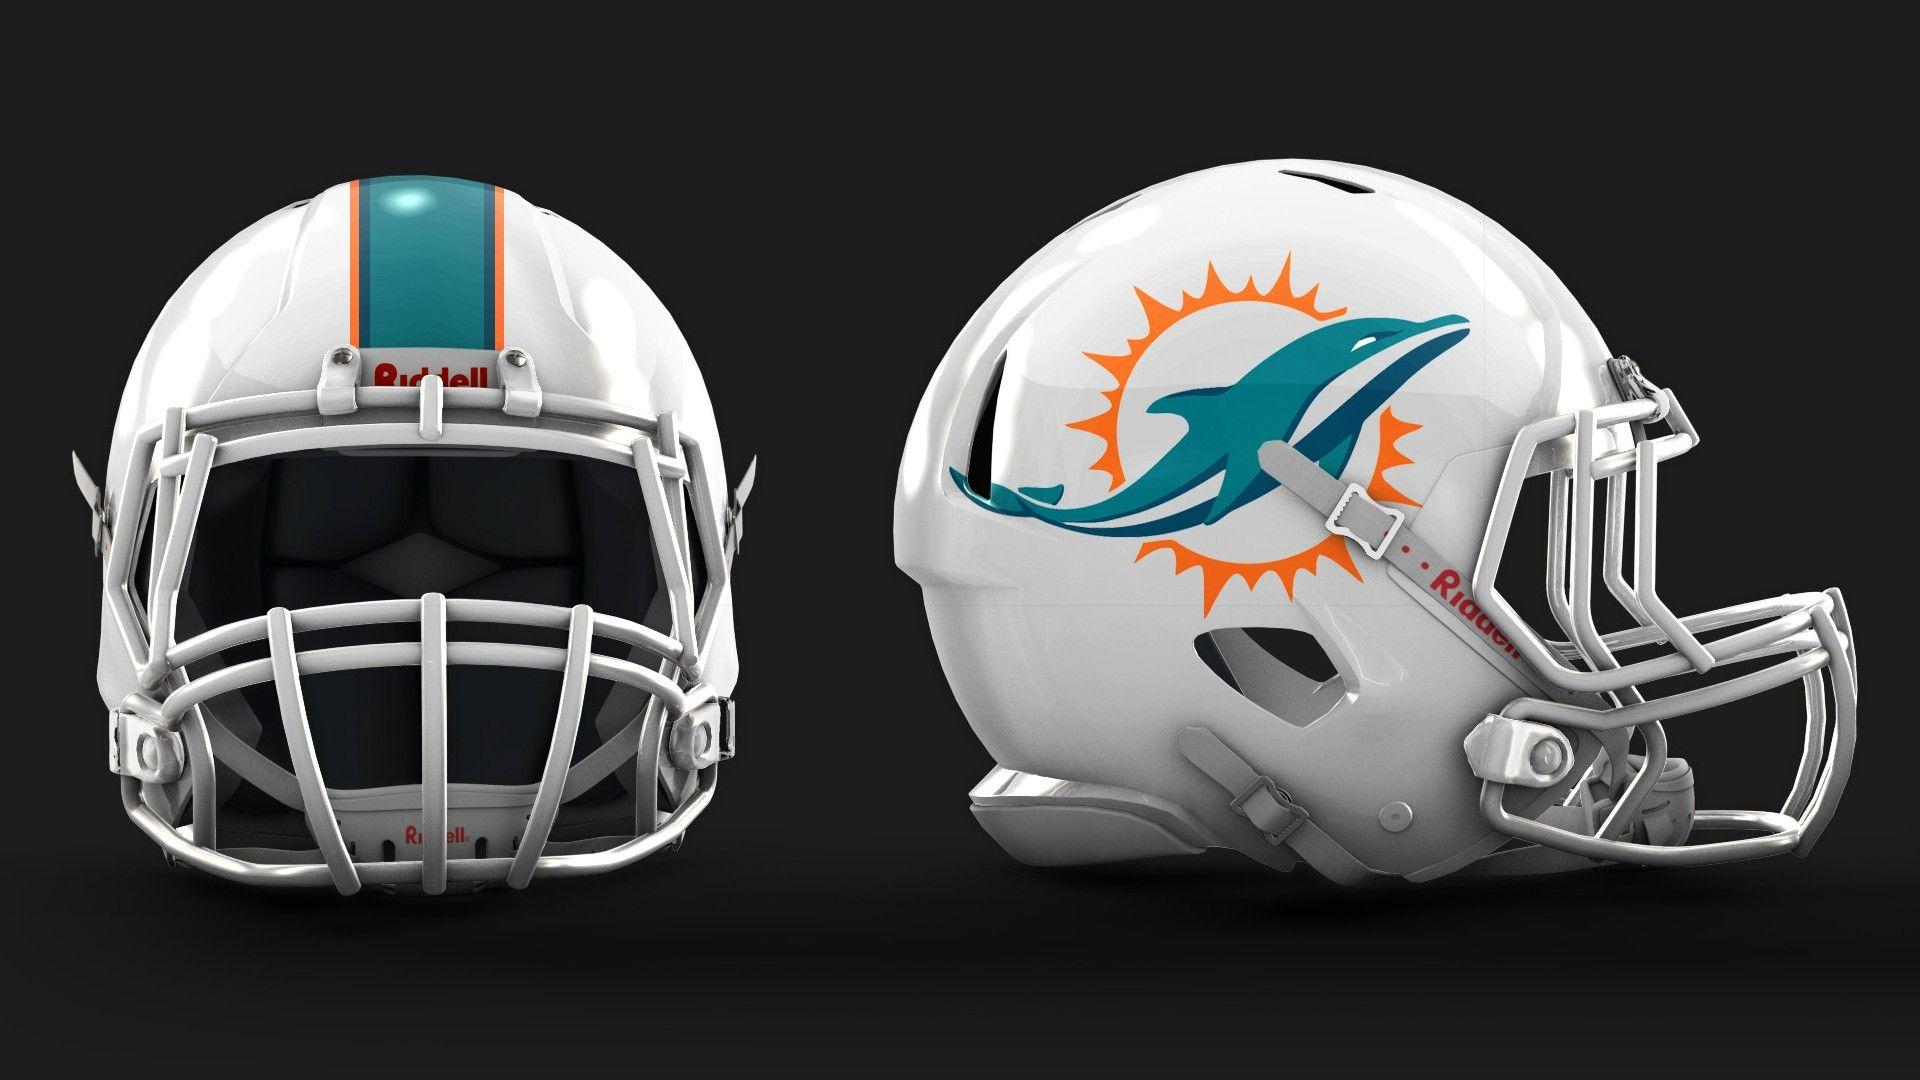 MIAMI DOLPHINS nfl football eq Miami dolphins logo